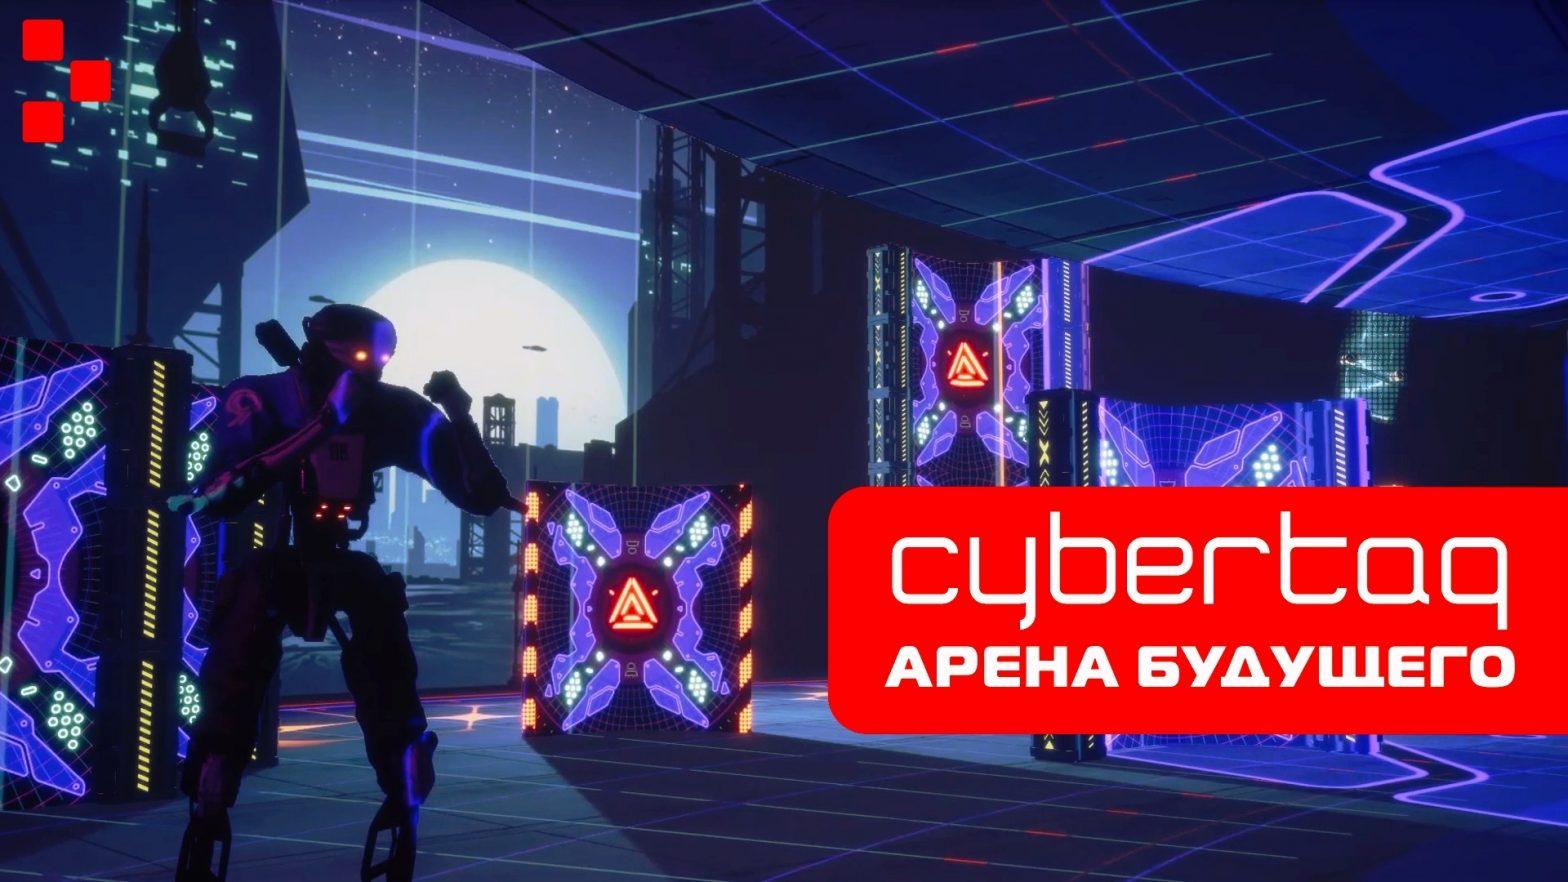 ЛАЗЕРТАГ-АРЕНА БУДУЩЕГО CYBERTAG